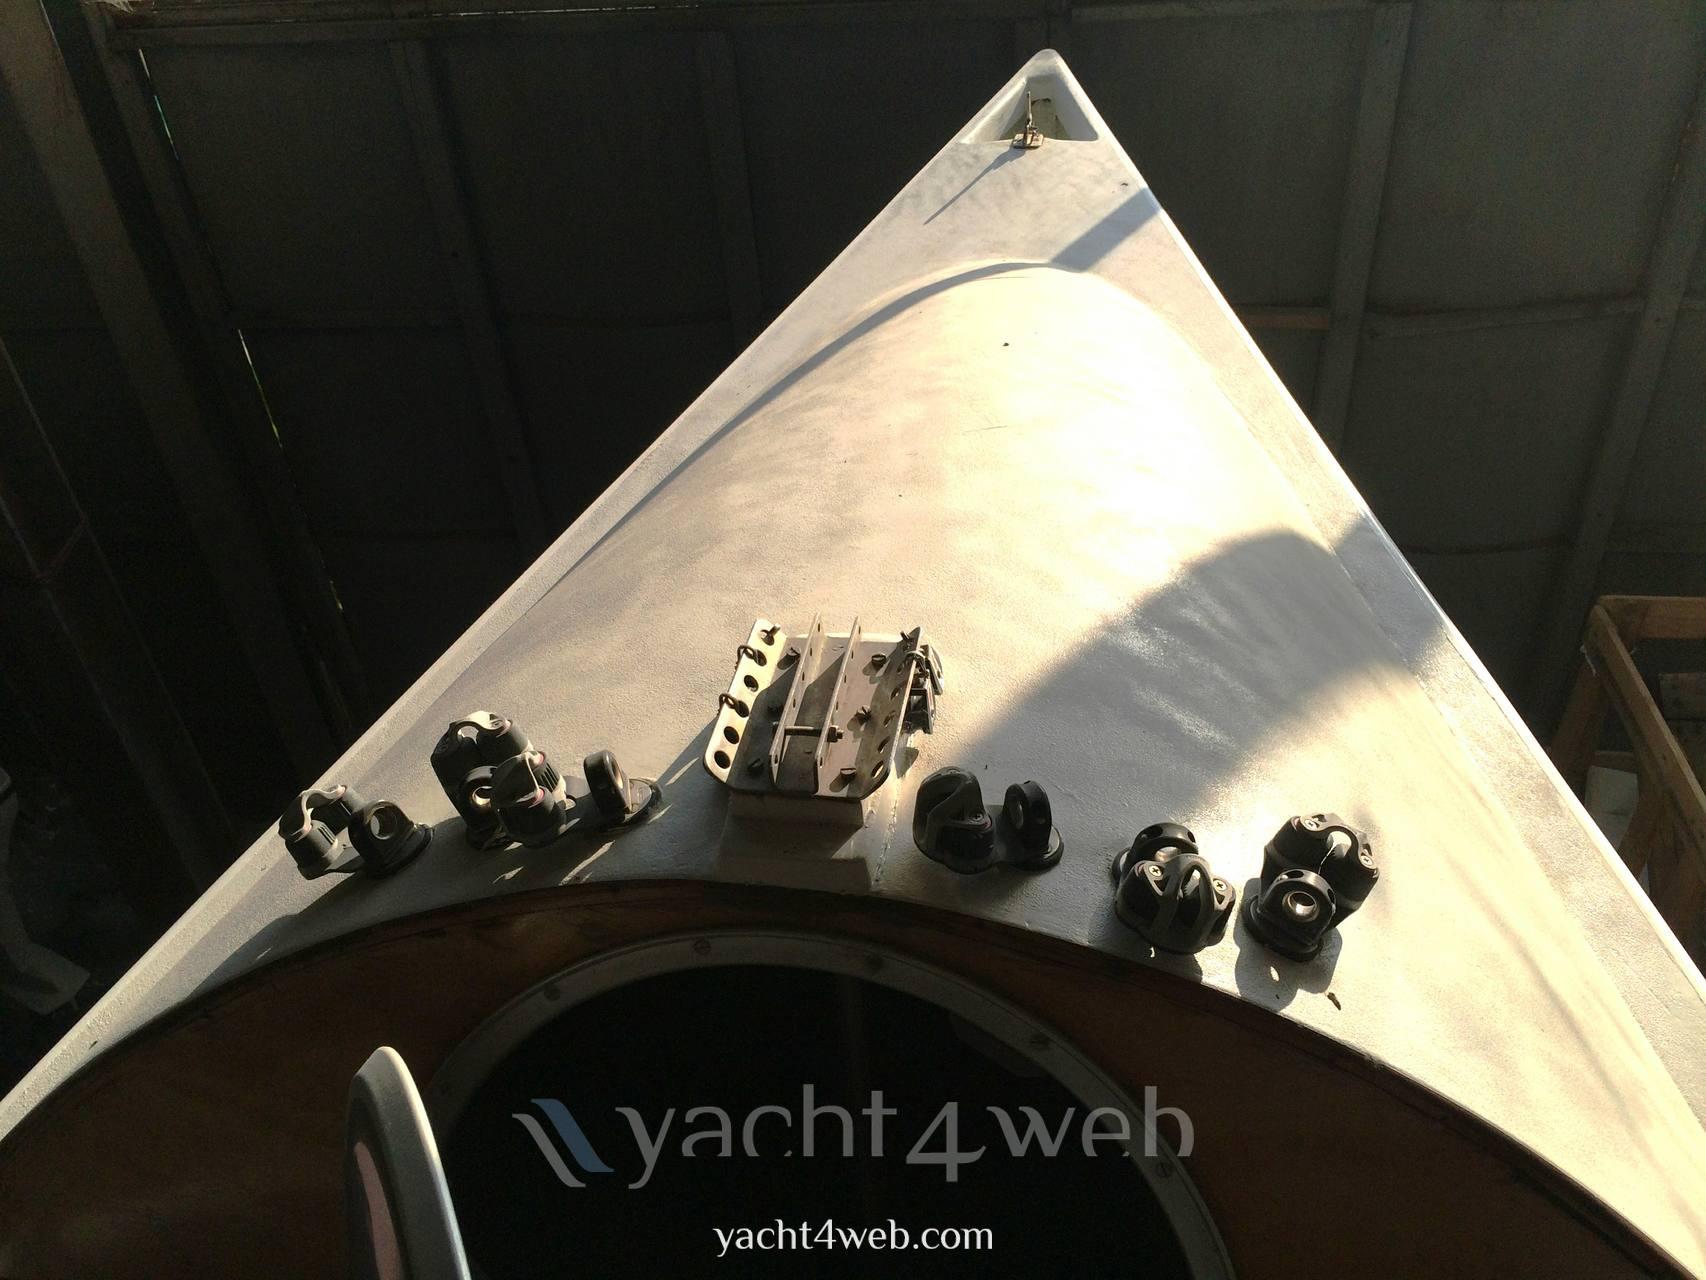 Mastro-d-ascia Spectre 20 day sailer Daysailers used